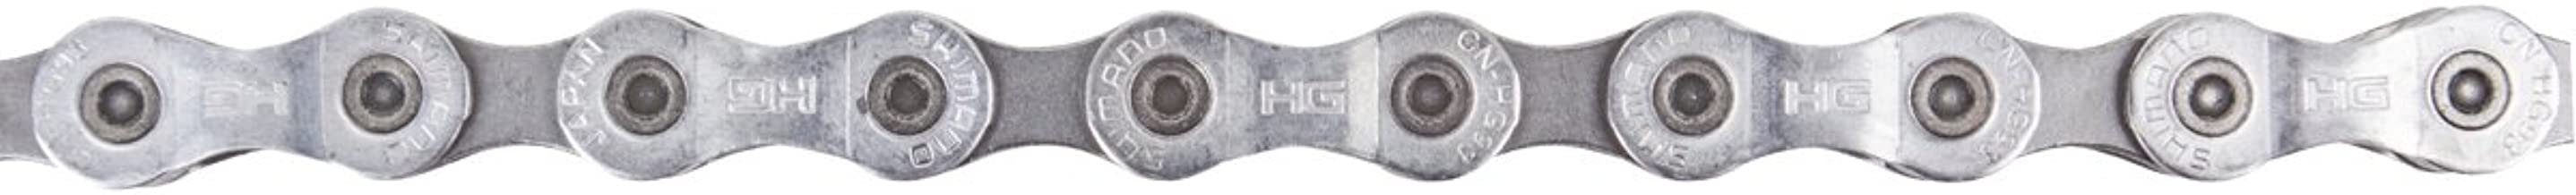 SHIMANO CN-HG93 Ultegra/XT 9-Speed Chain